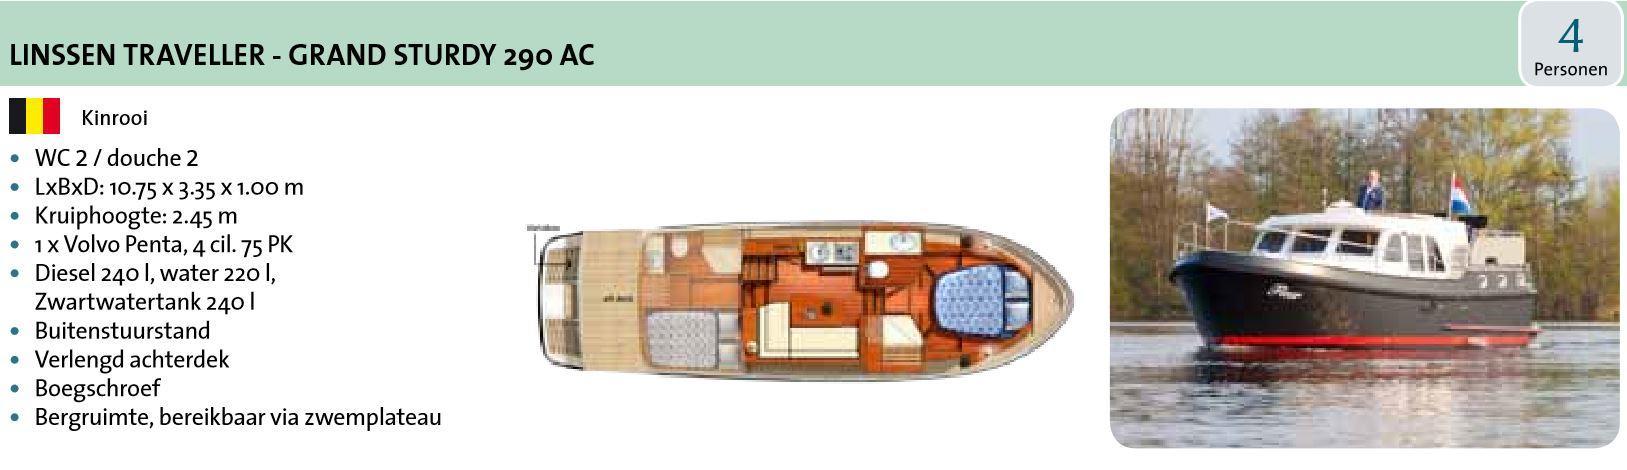 Linsen traveller 290 Ac bboat